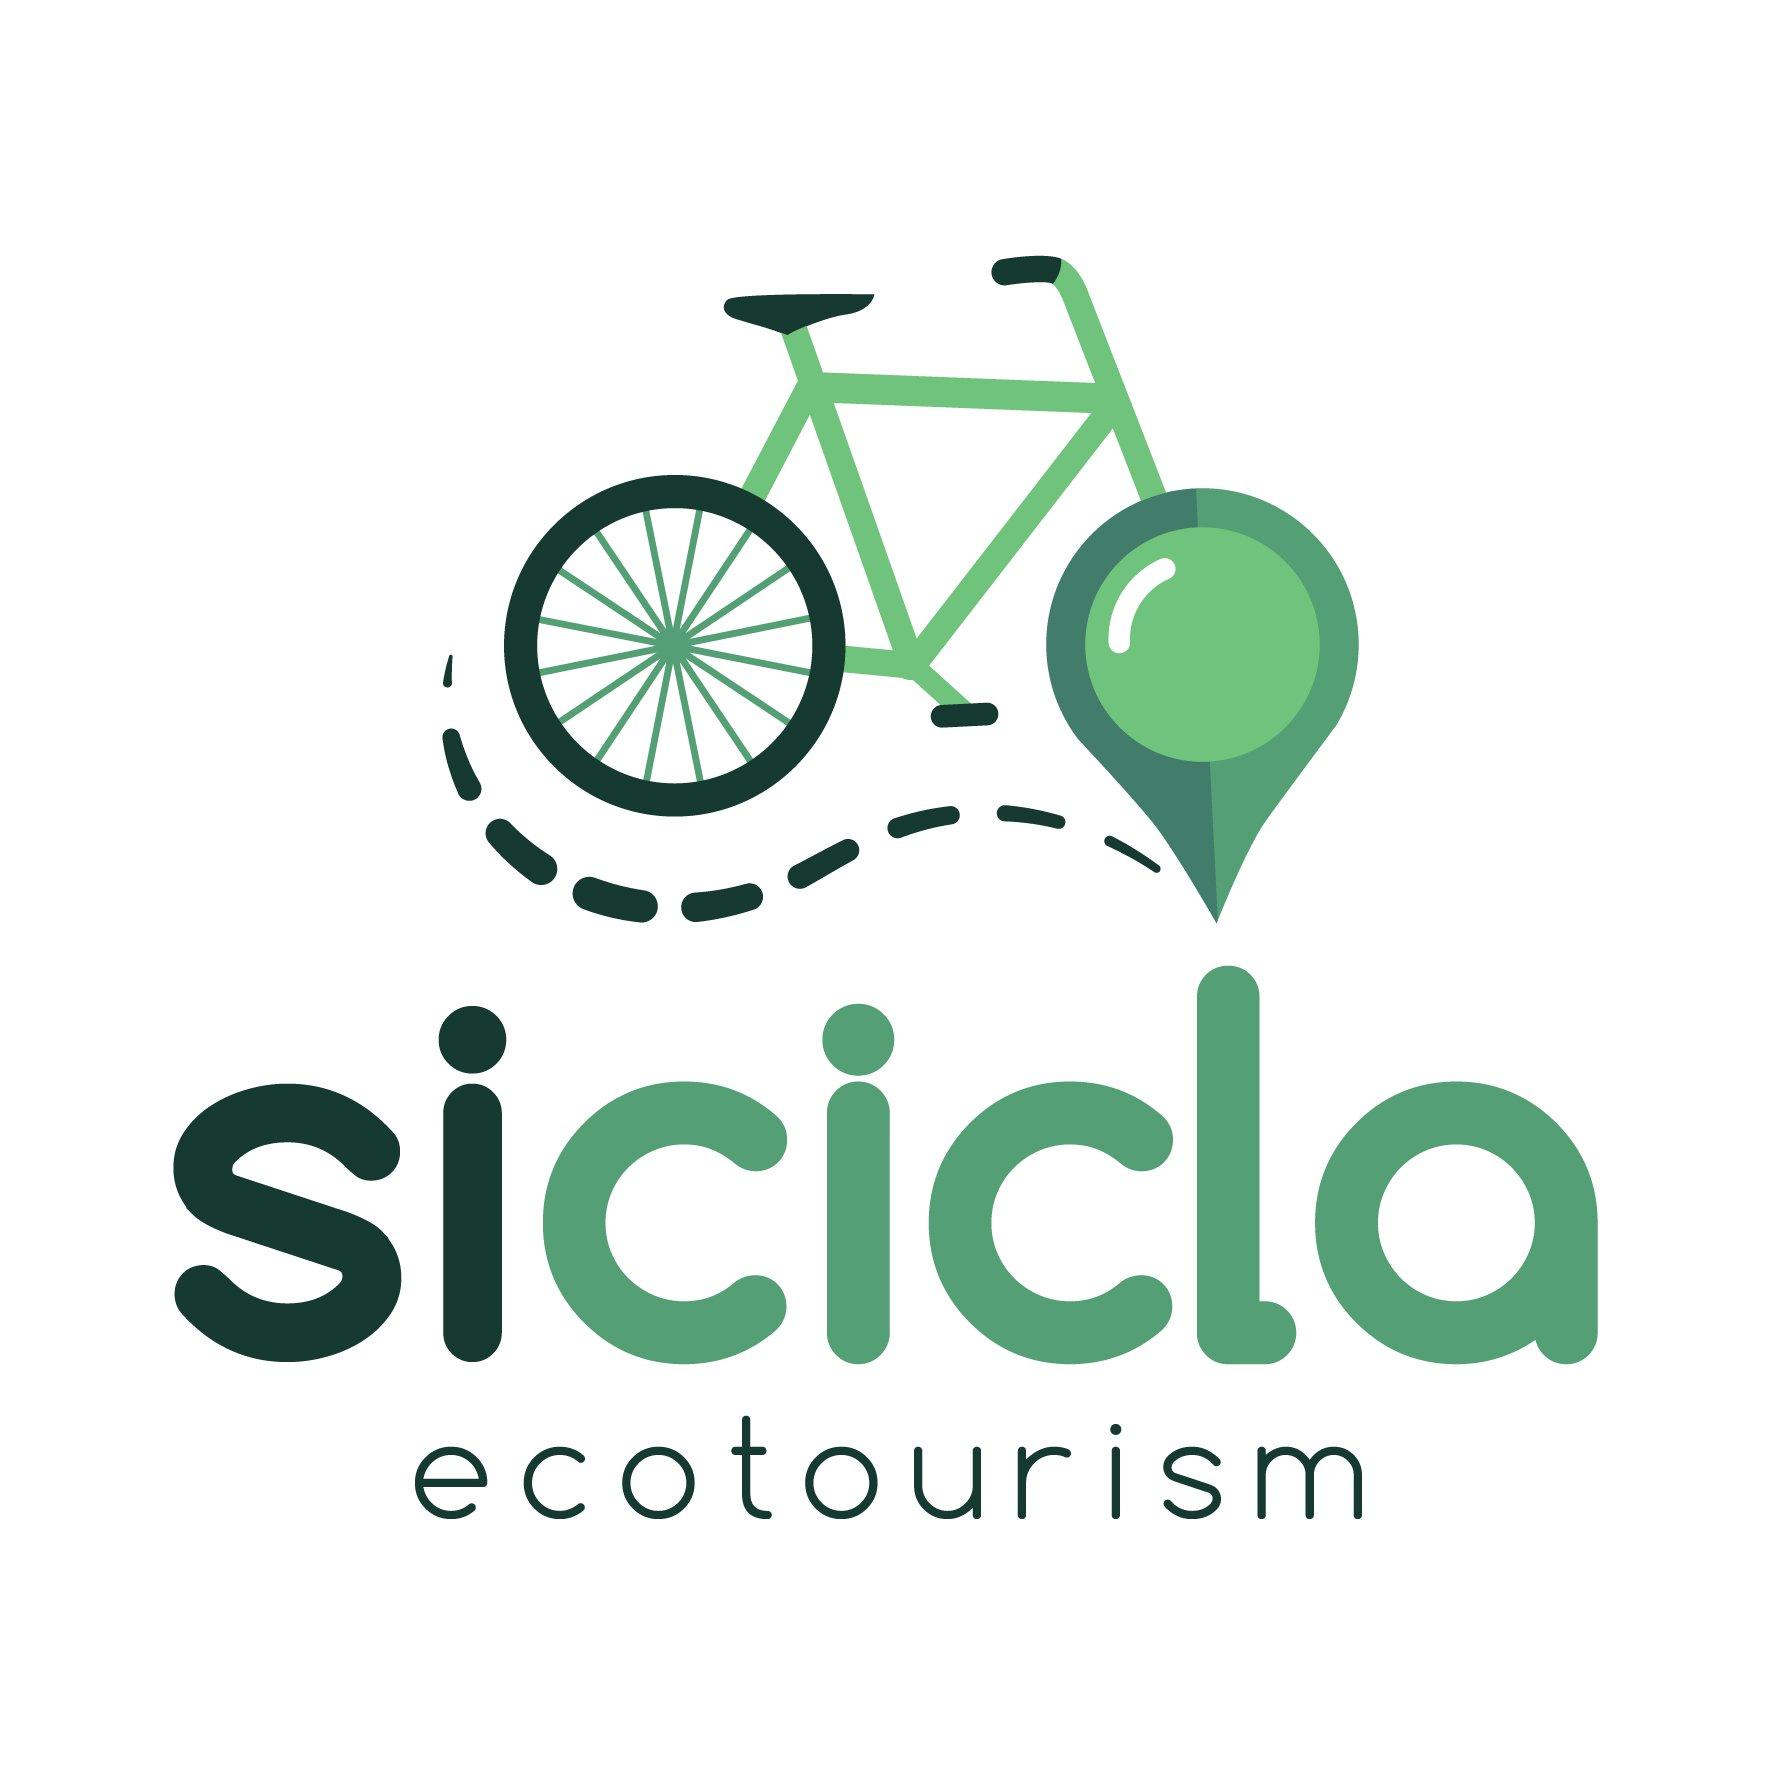 Sicicla